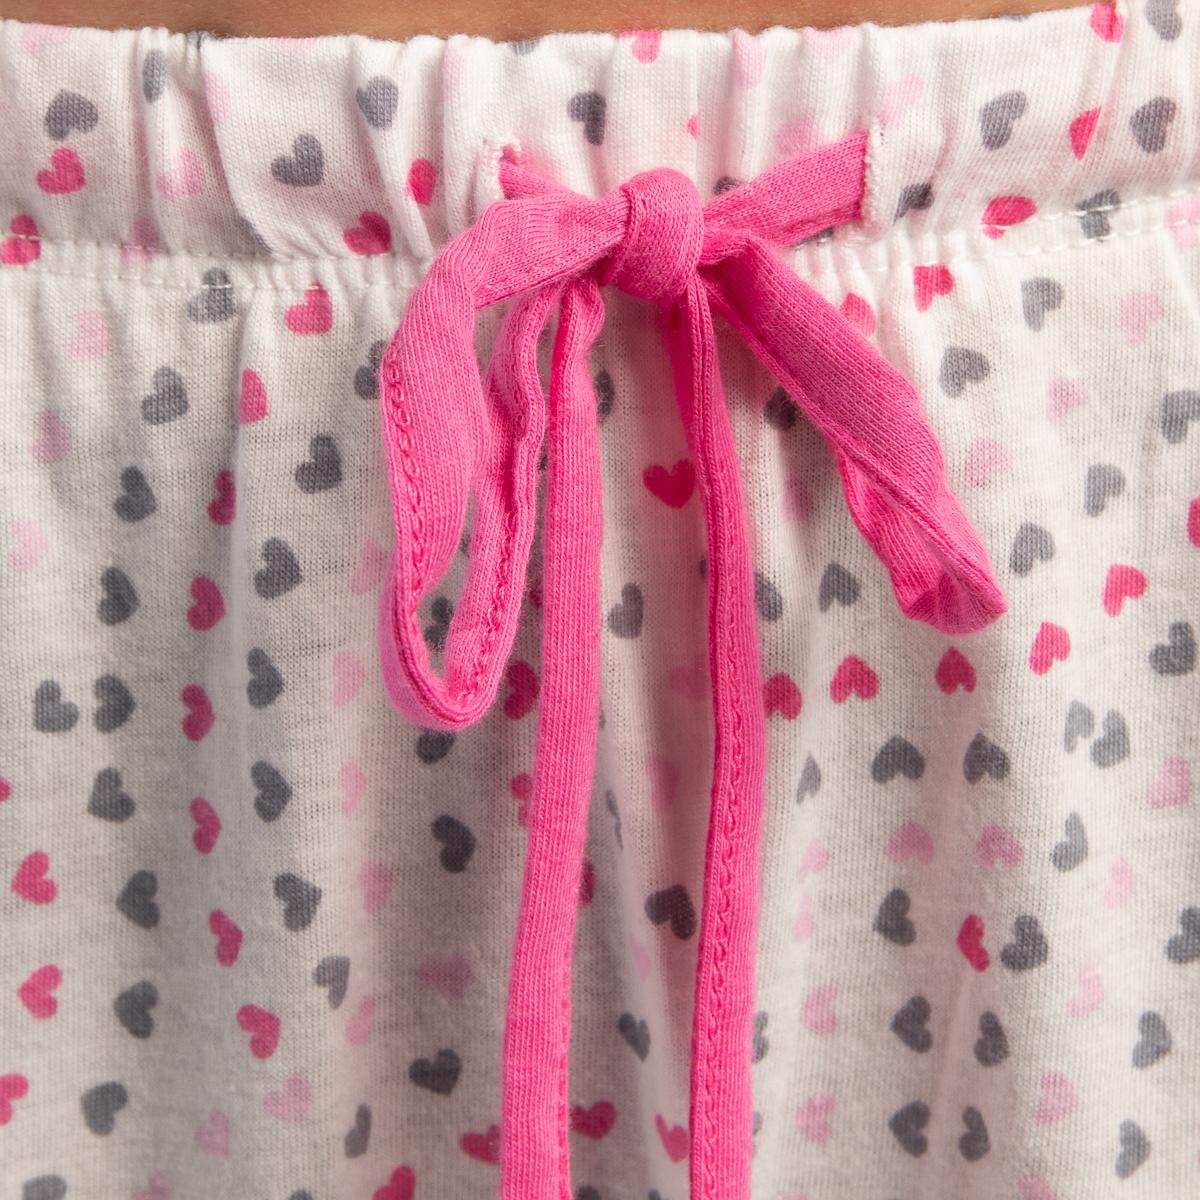 2-Piece-Jockey-Cotton-Pajamas-For-Women-Set-Long-Sleeve-Top-Bottom-PJs-Sleepwear thumbnail 13